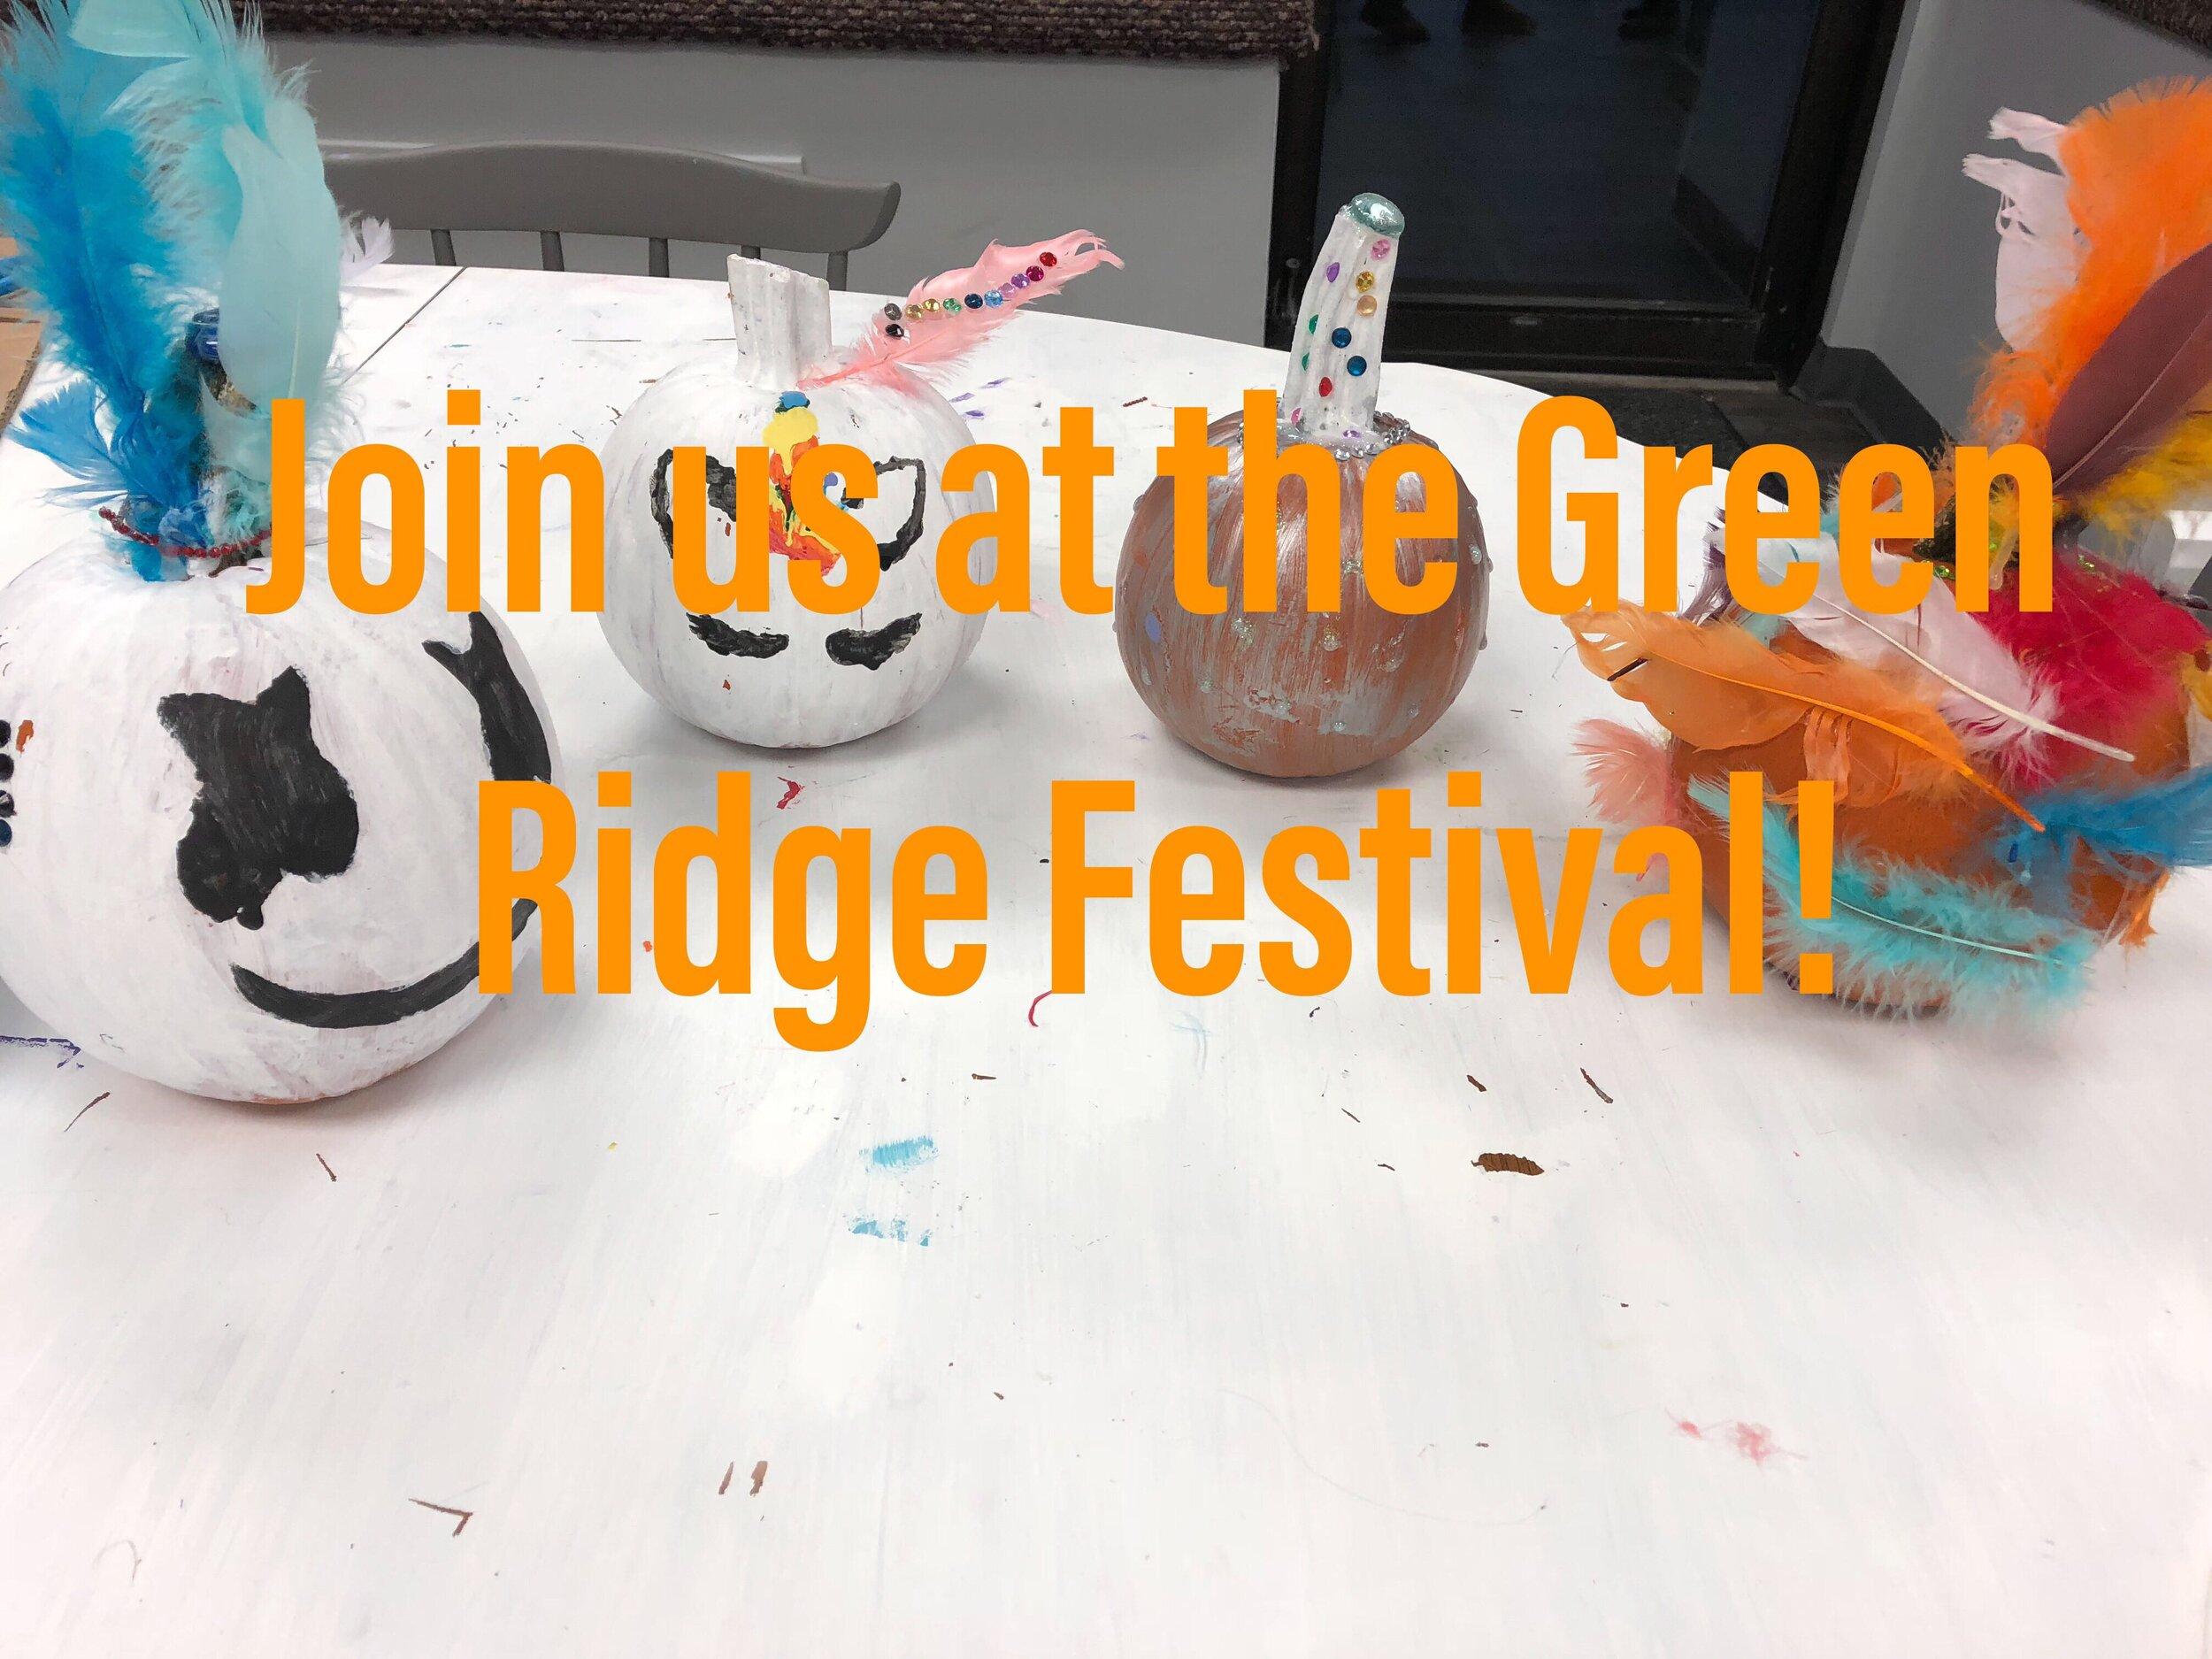 Green Ridge Festival.jpeg